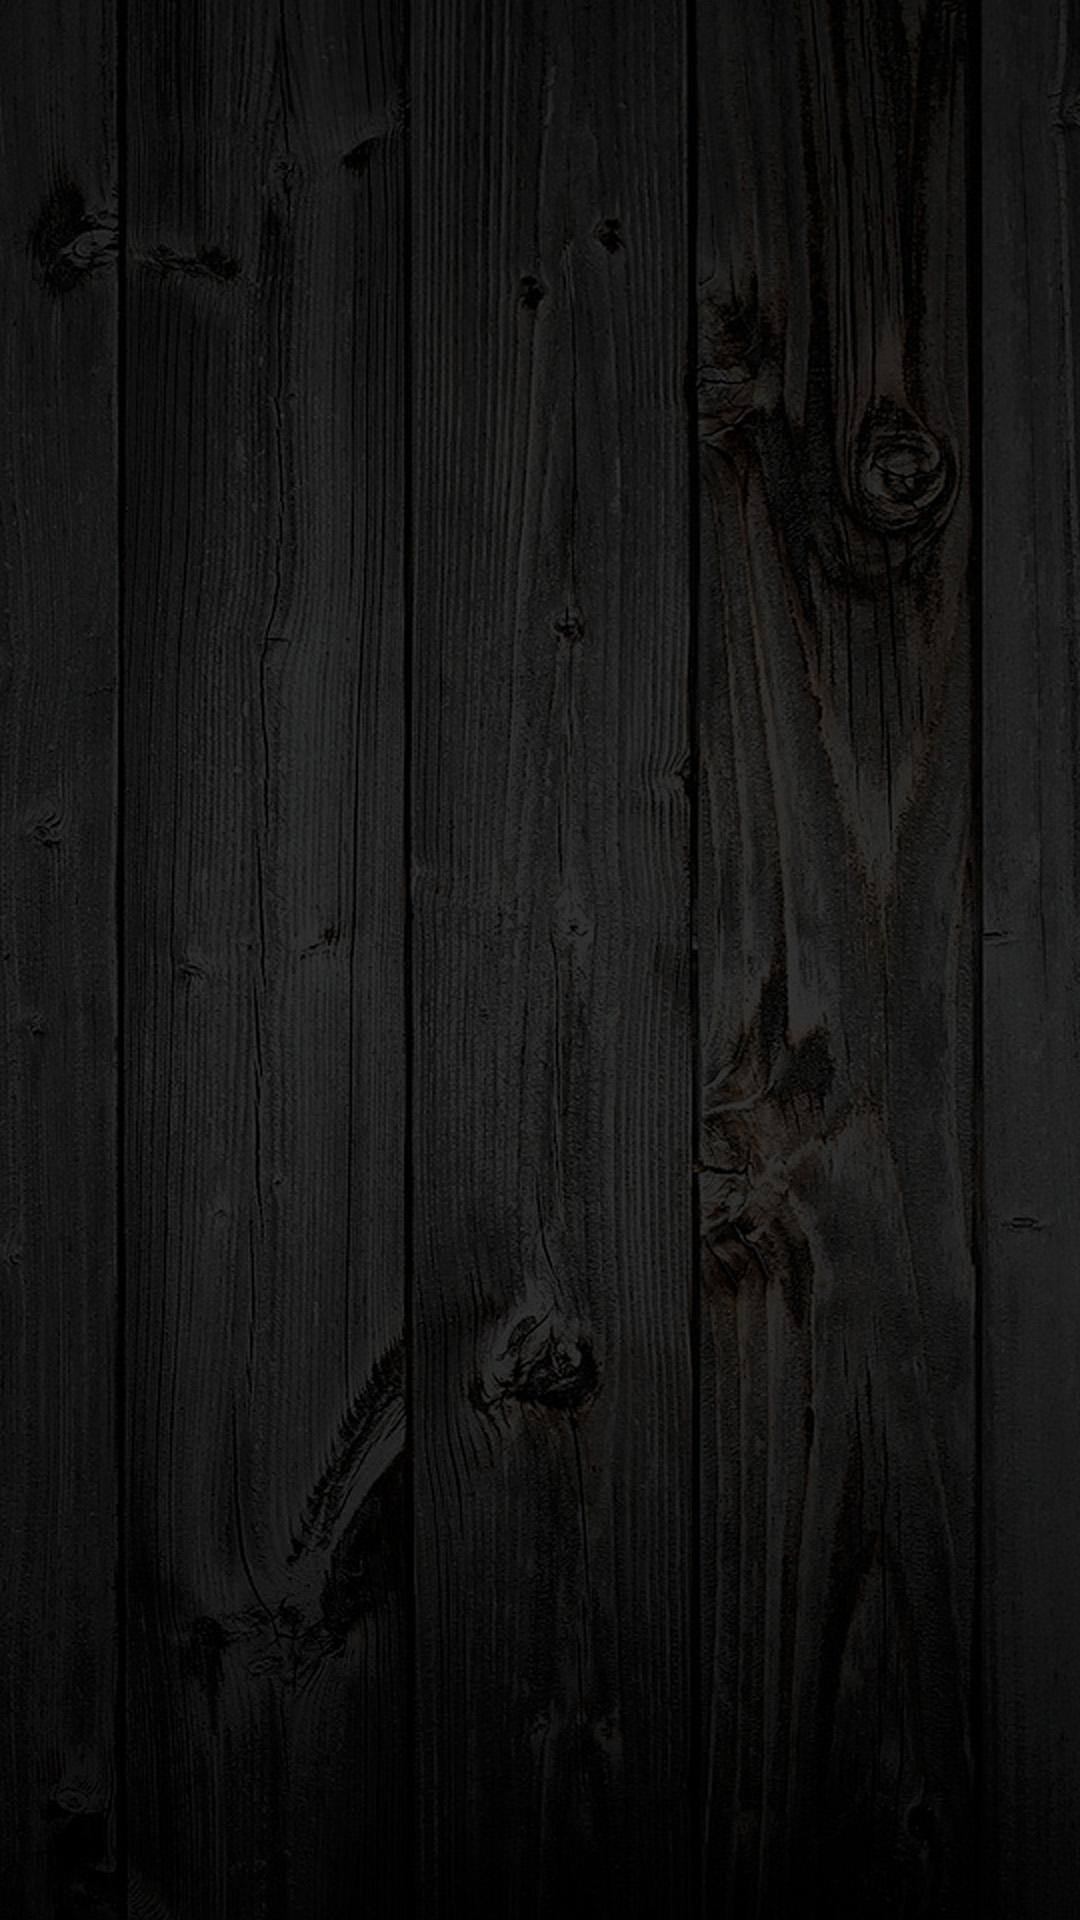 black wood wallpaper hd wallpapersafari. Black Bedroom Furniture Sets. Home Design Ideas